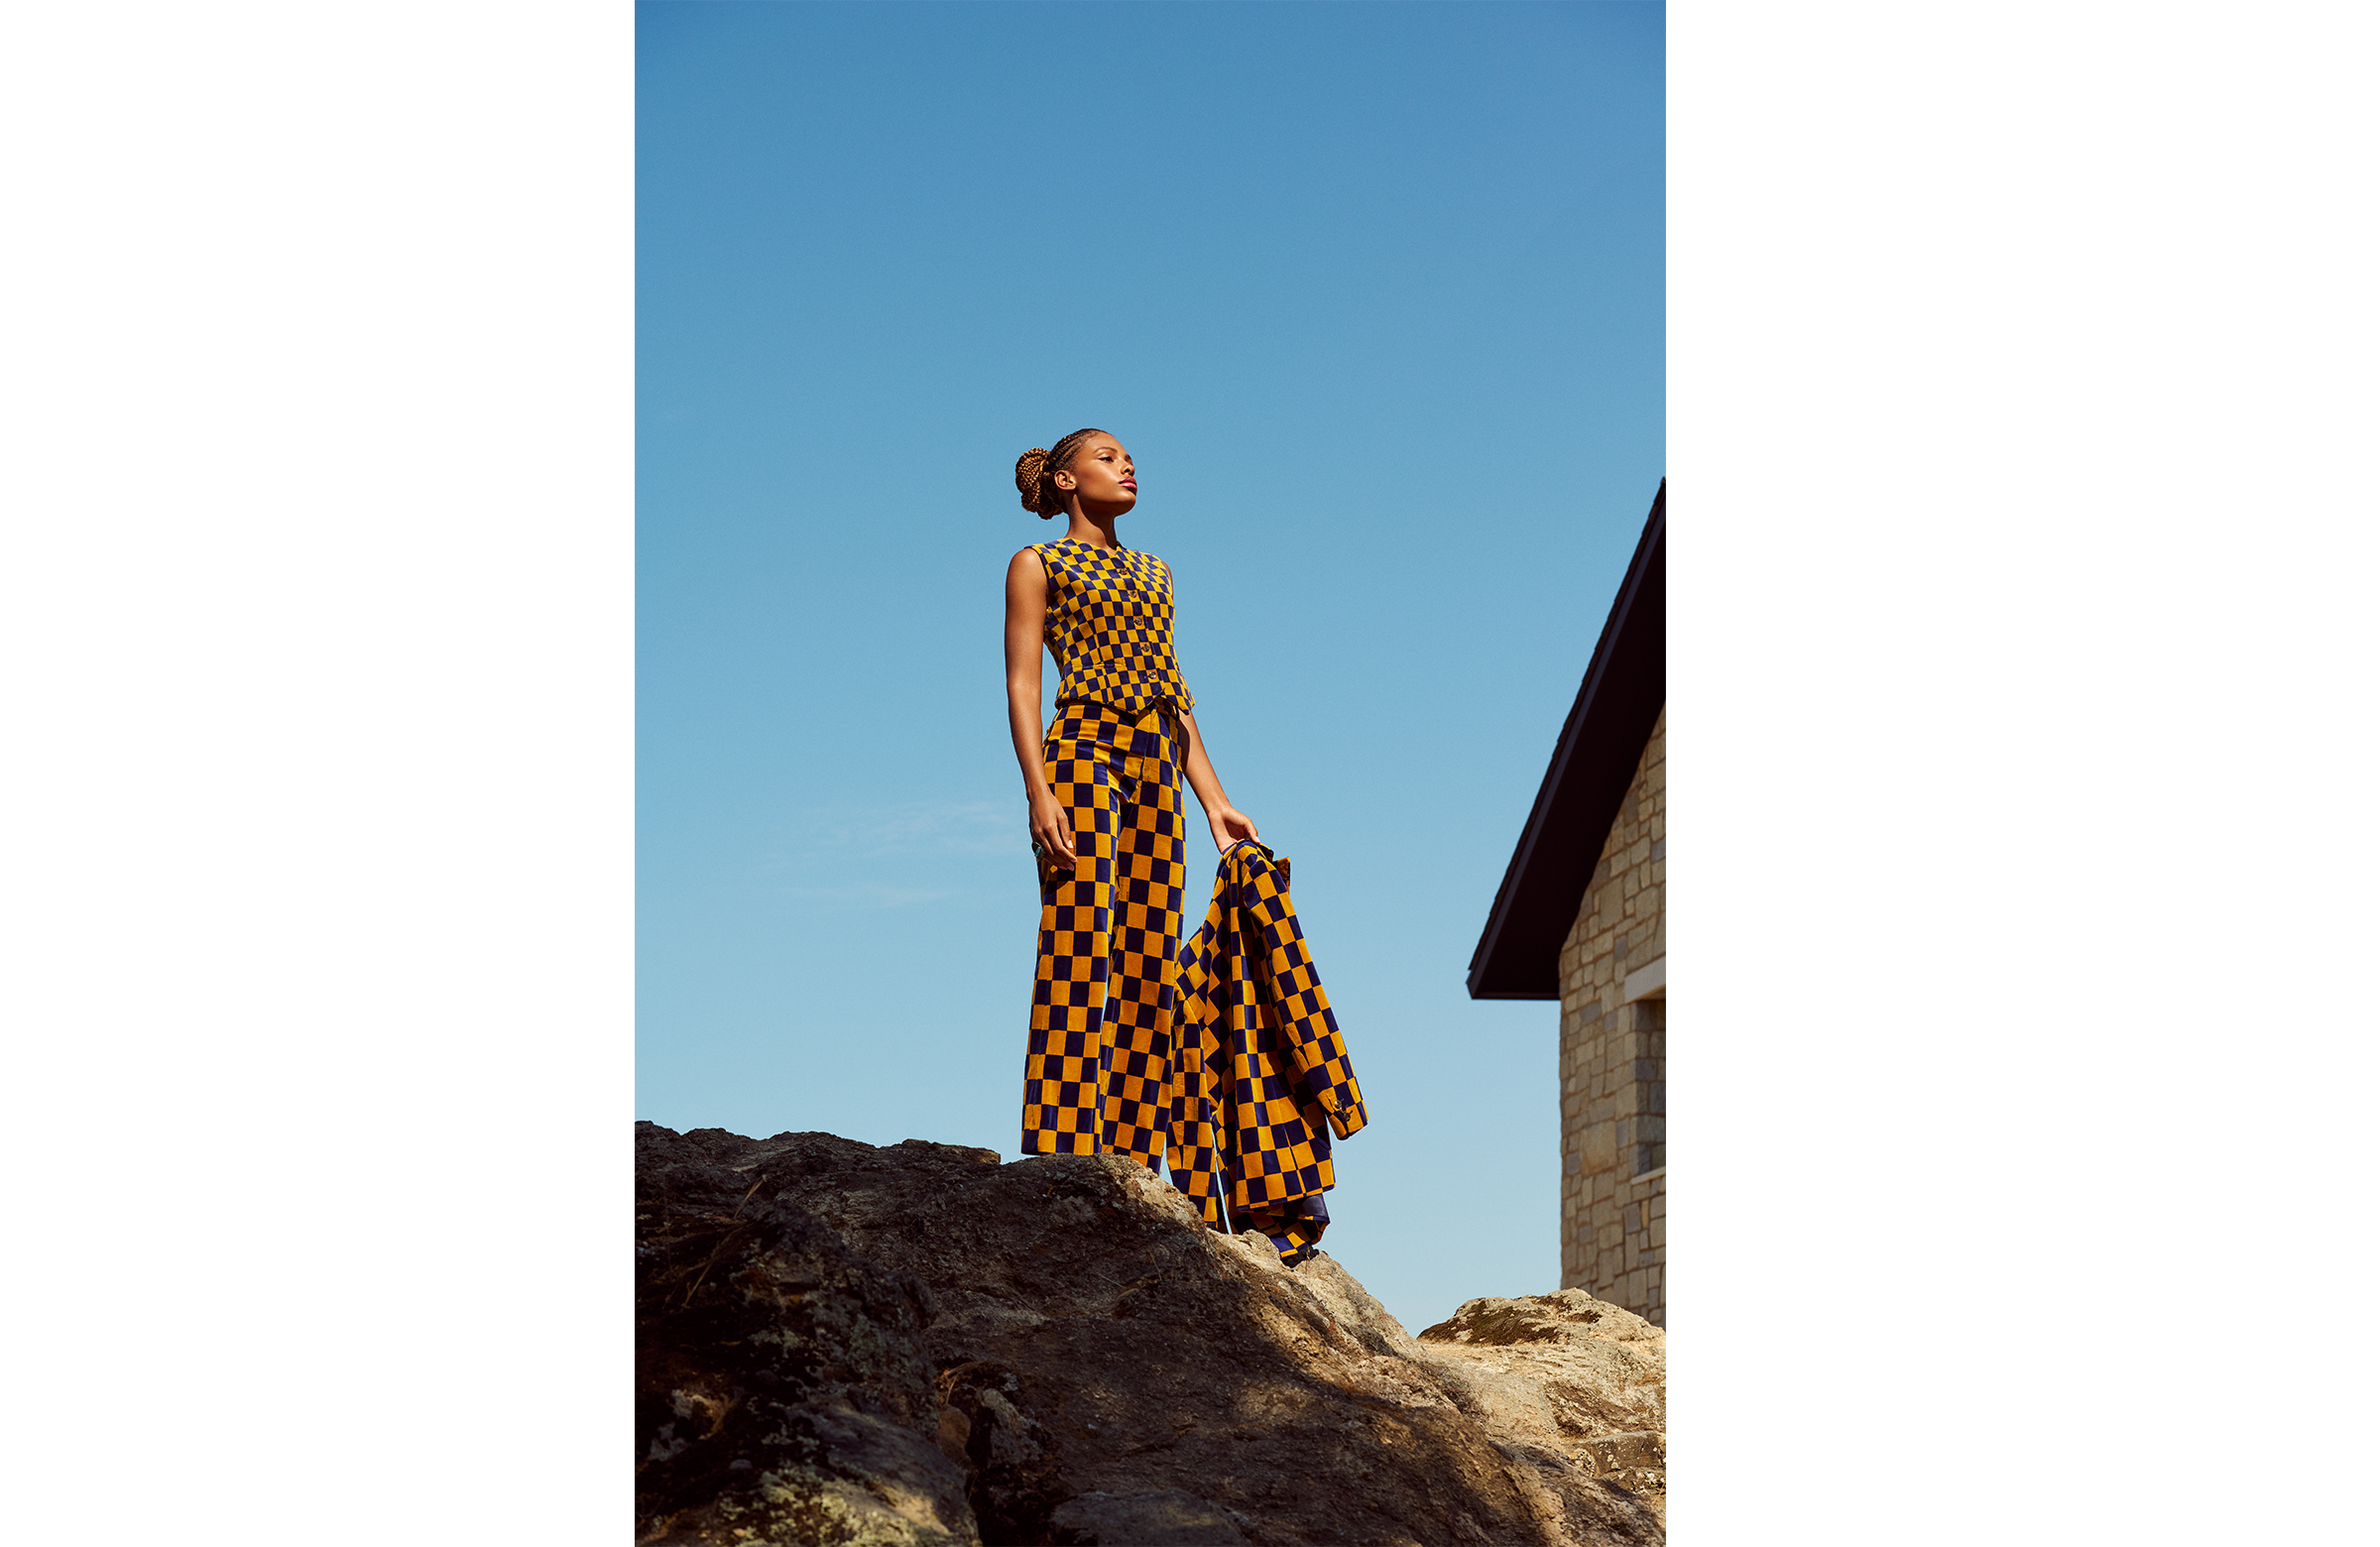 2021 Fs Fall Fashion Image 1152x749